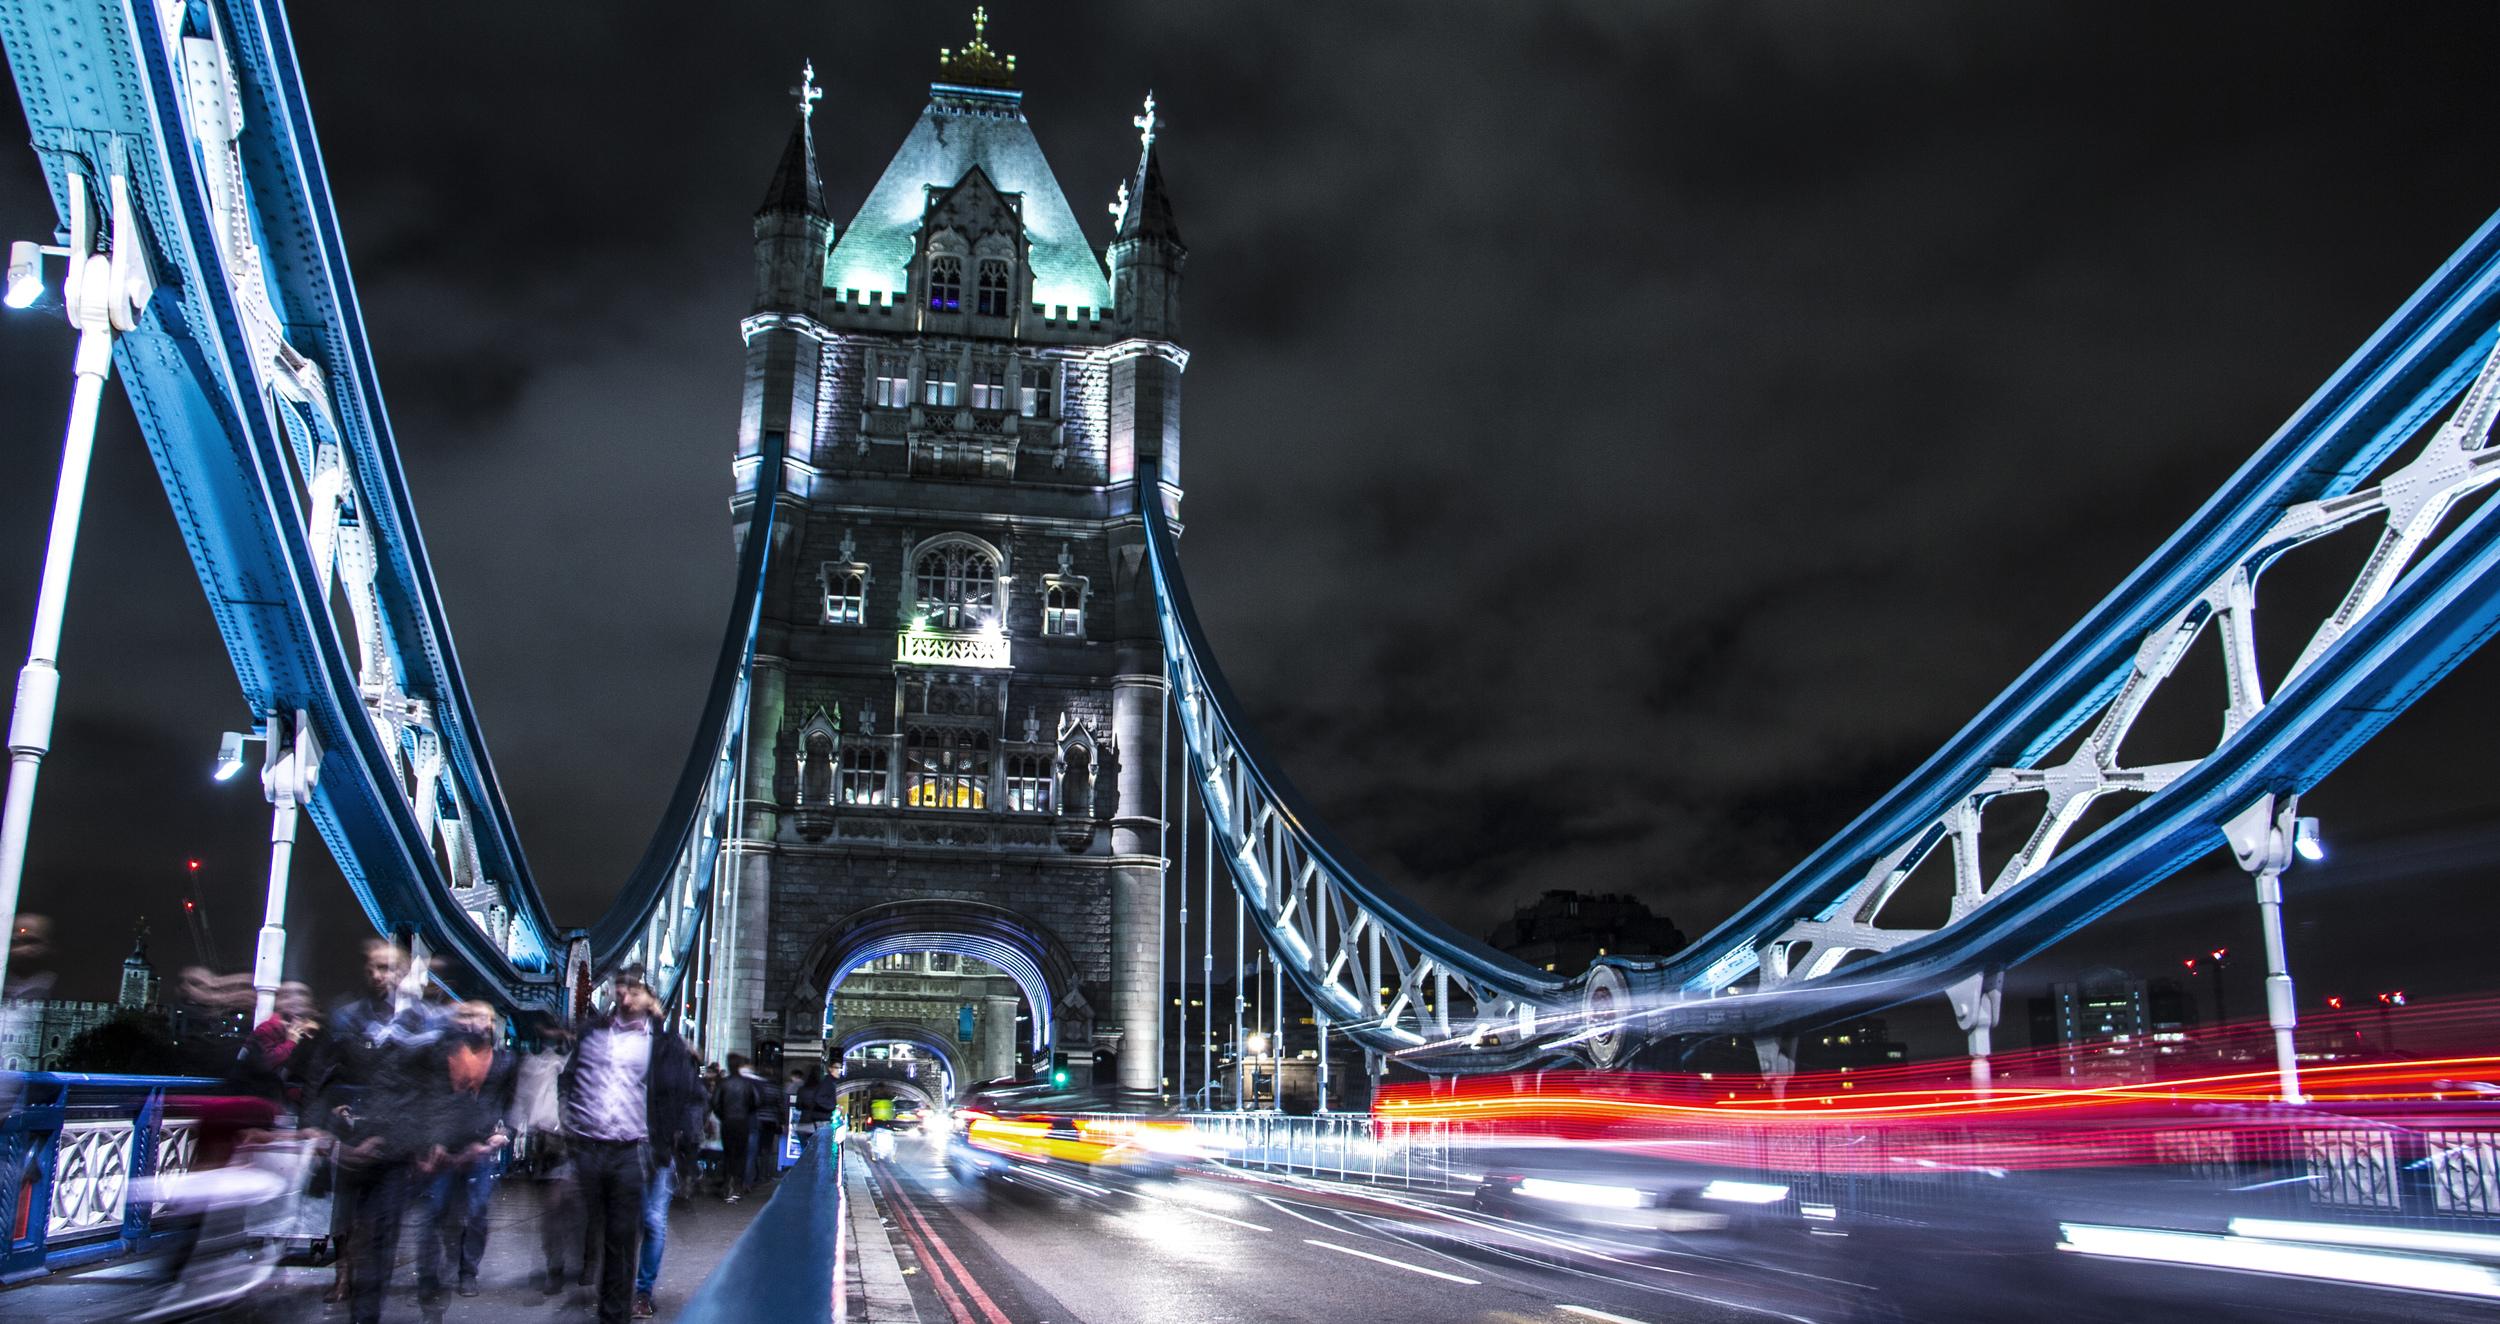 Photograph of Tower Bridge, London